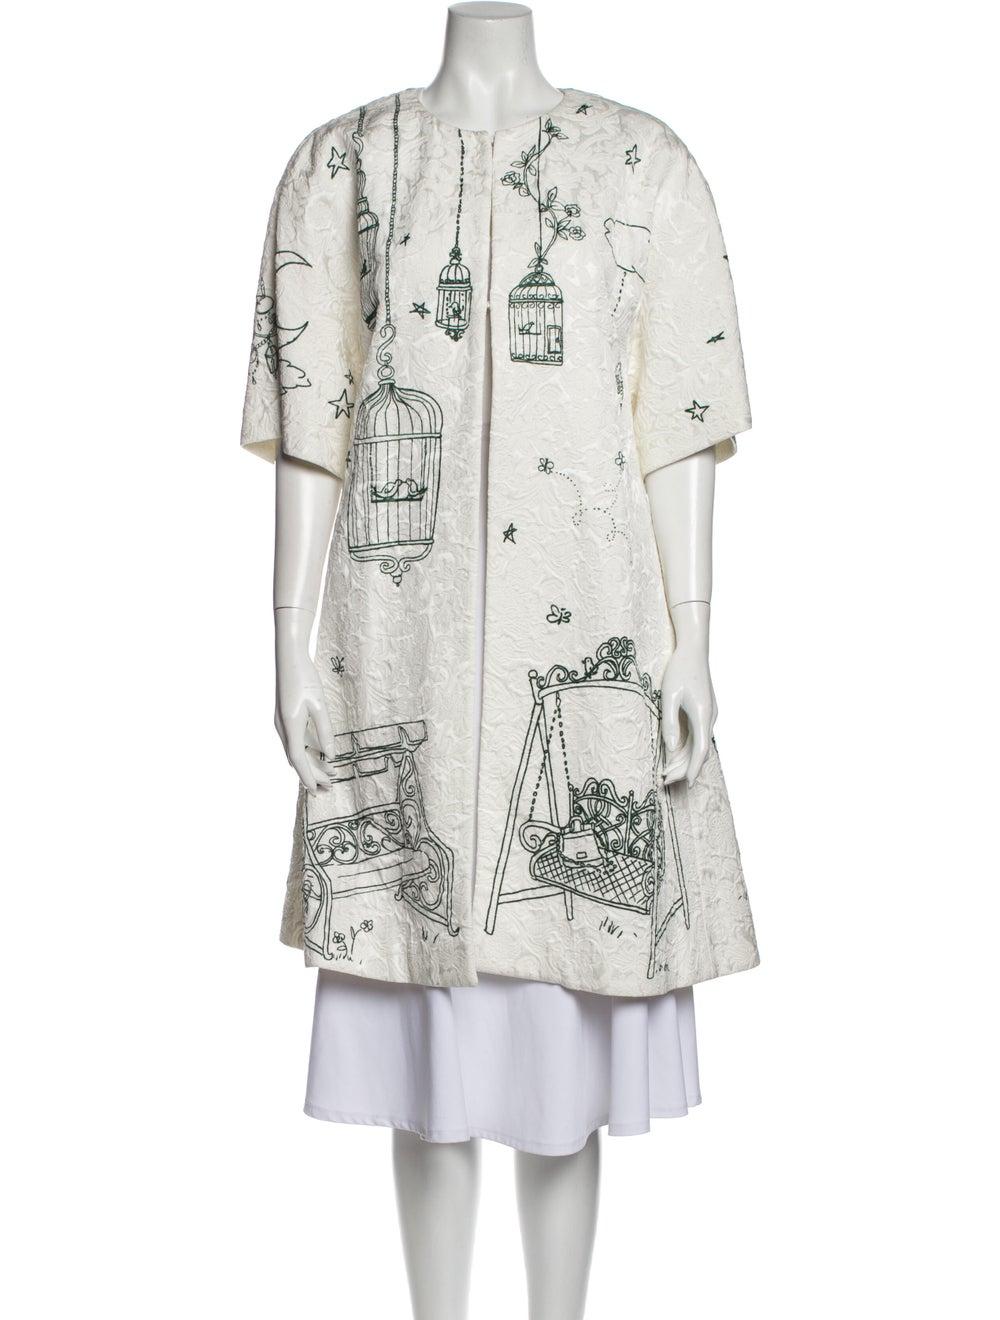 Dolce & Gabbana Printed Coat White - image 1